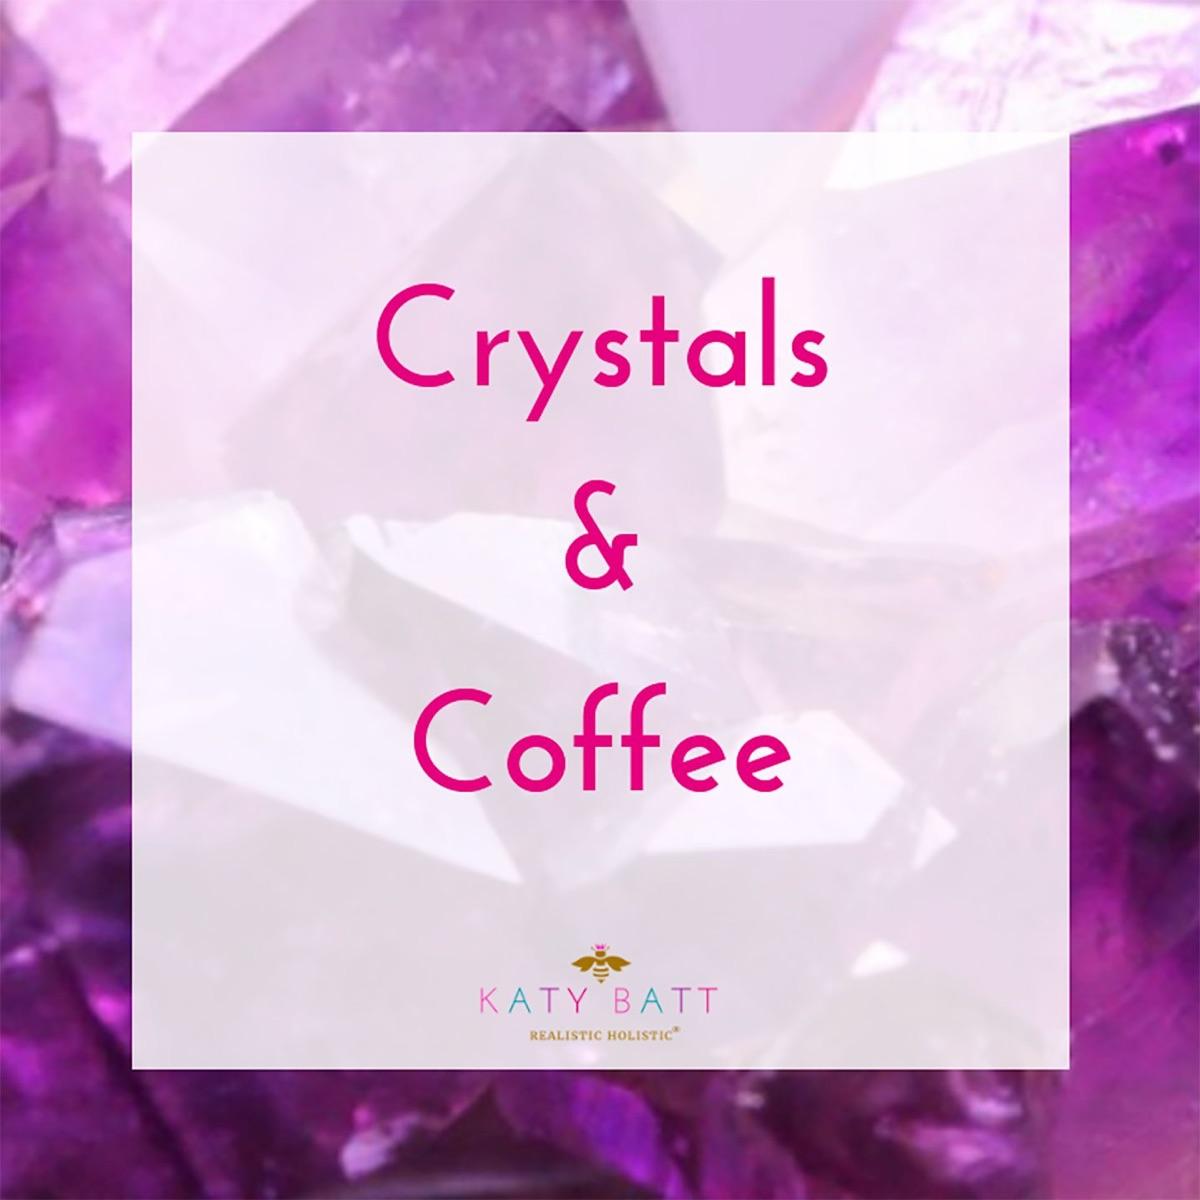 Crystals & Coffee